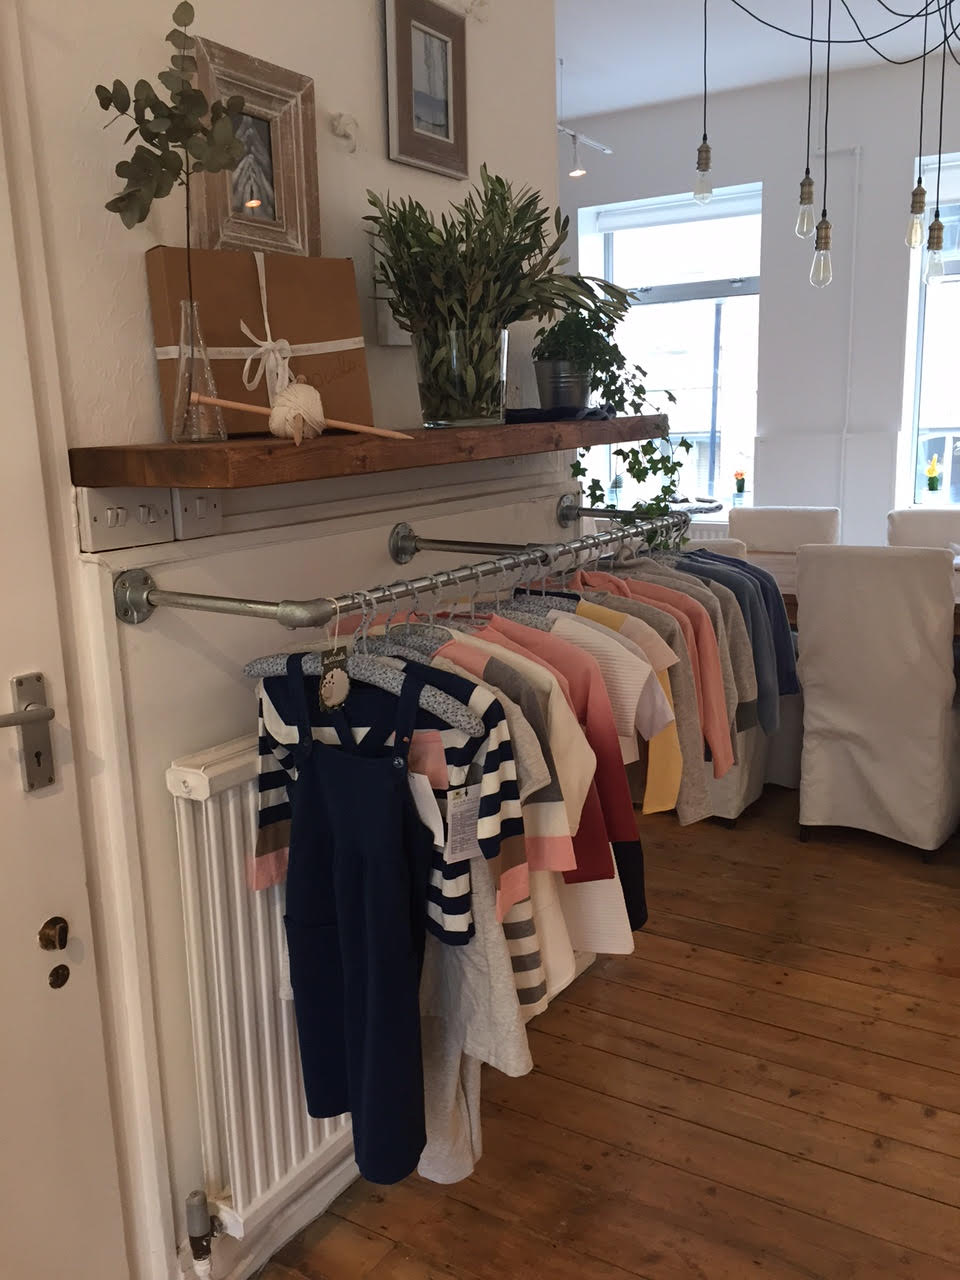 Custom clothing rails